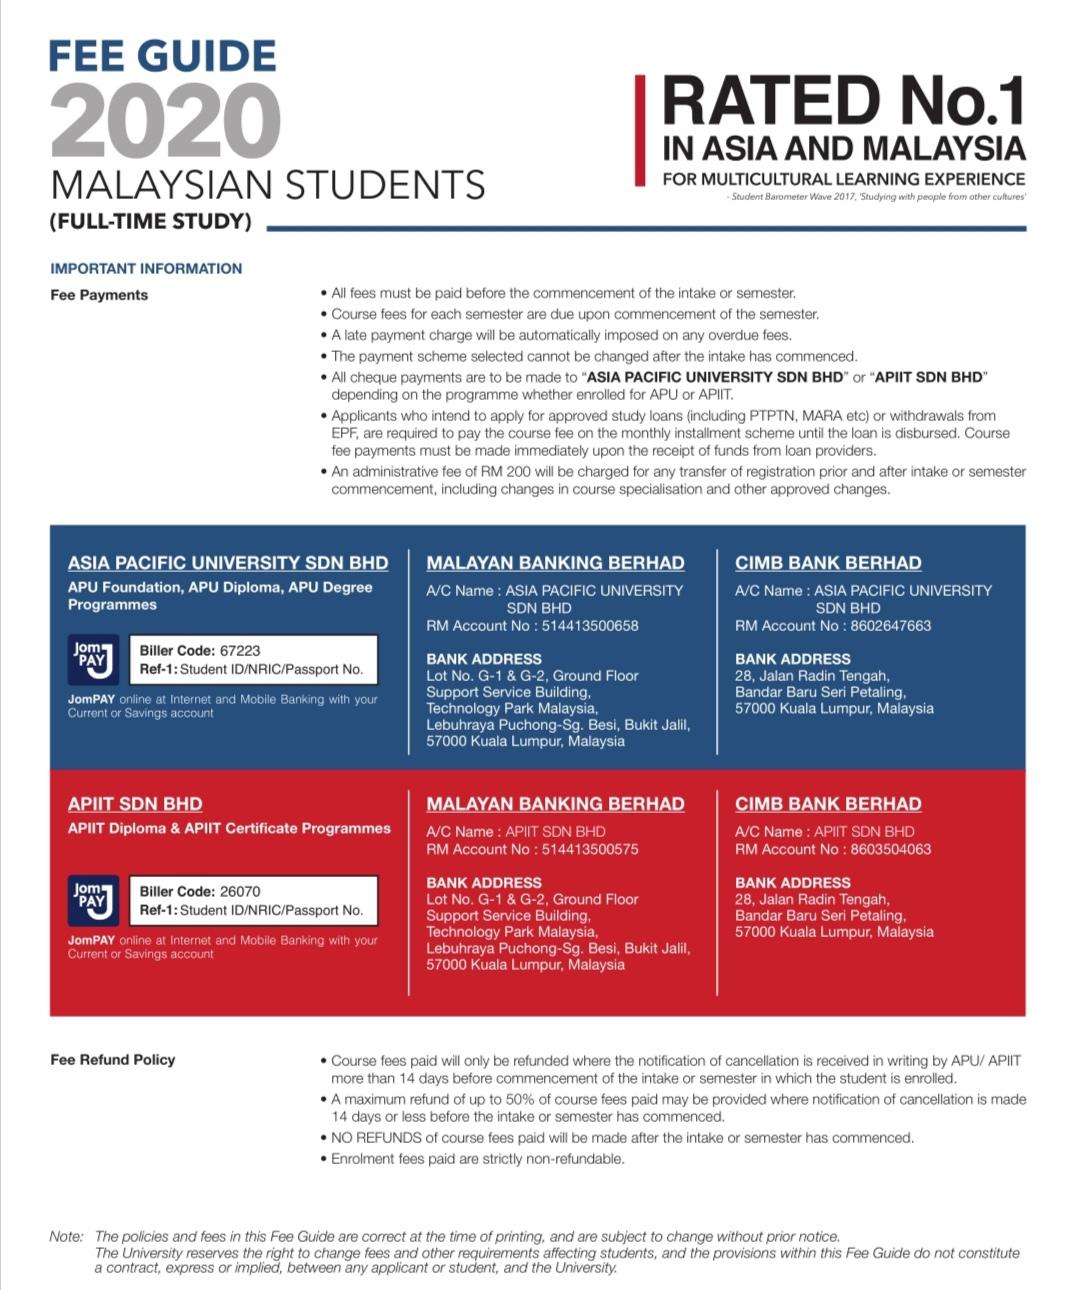 Asia Pacific University (APU) Bank Account Details